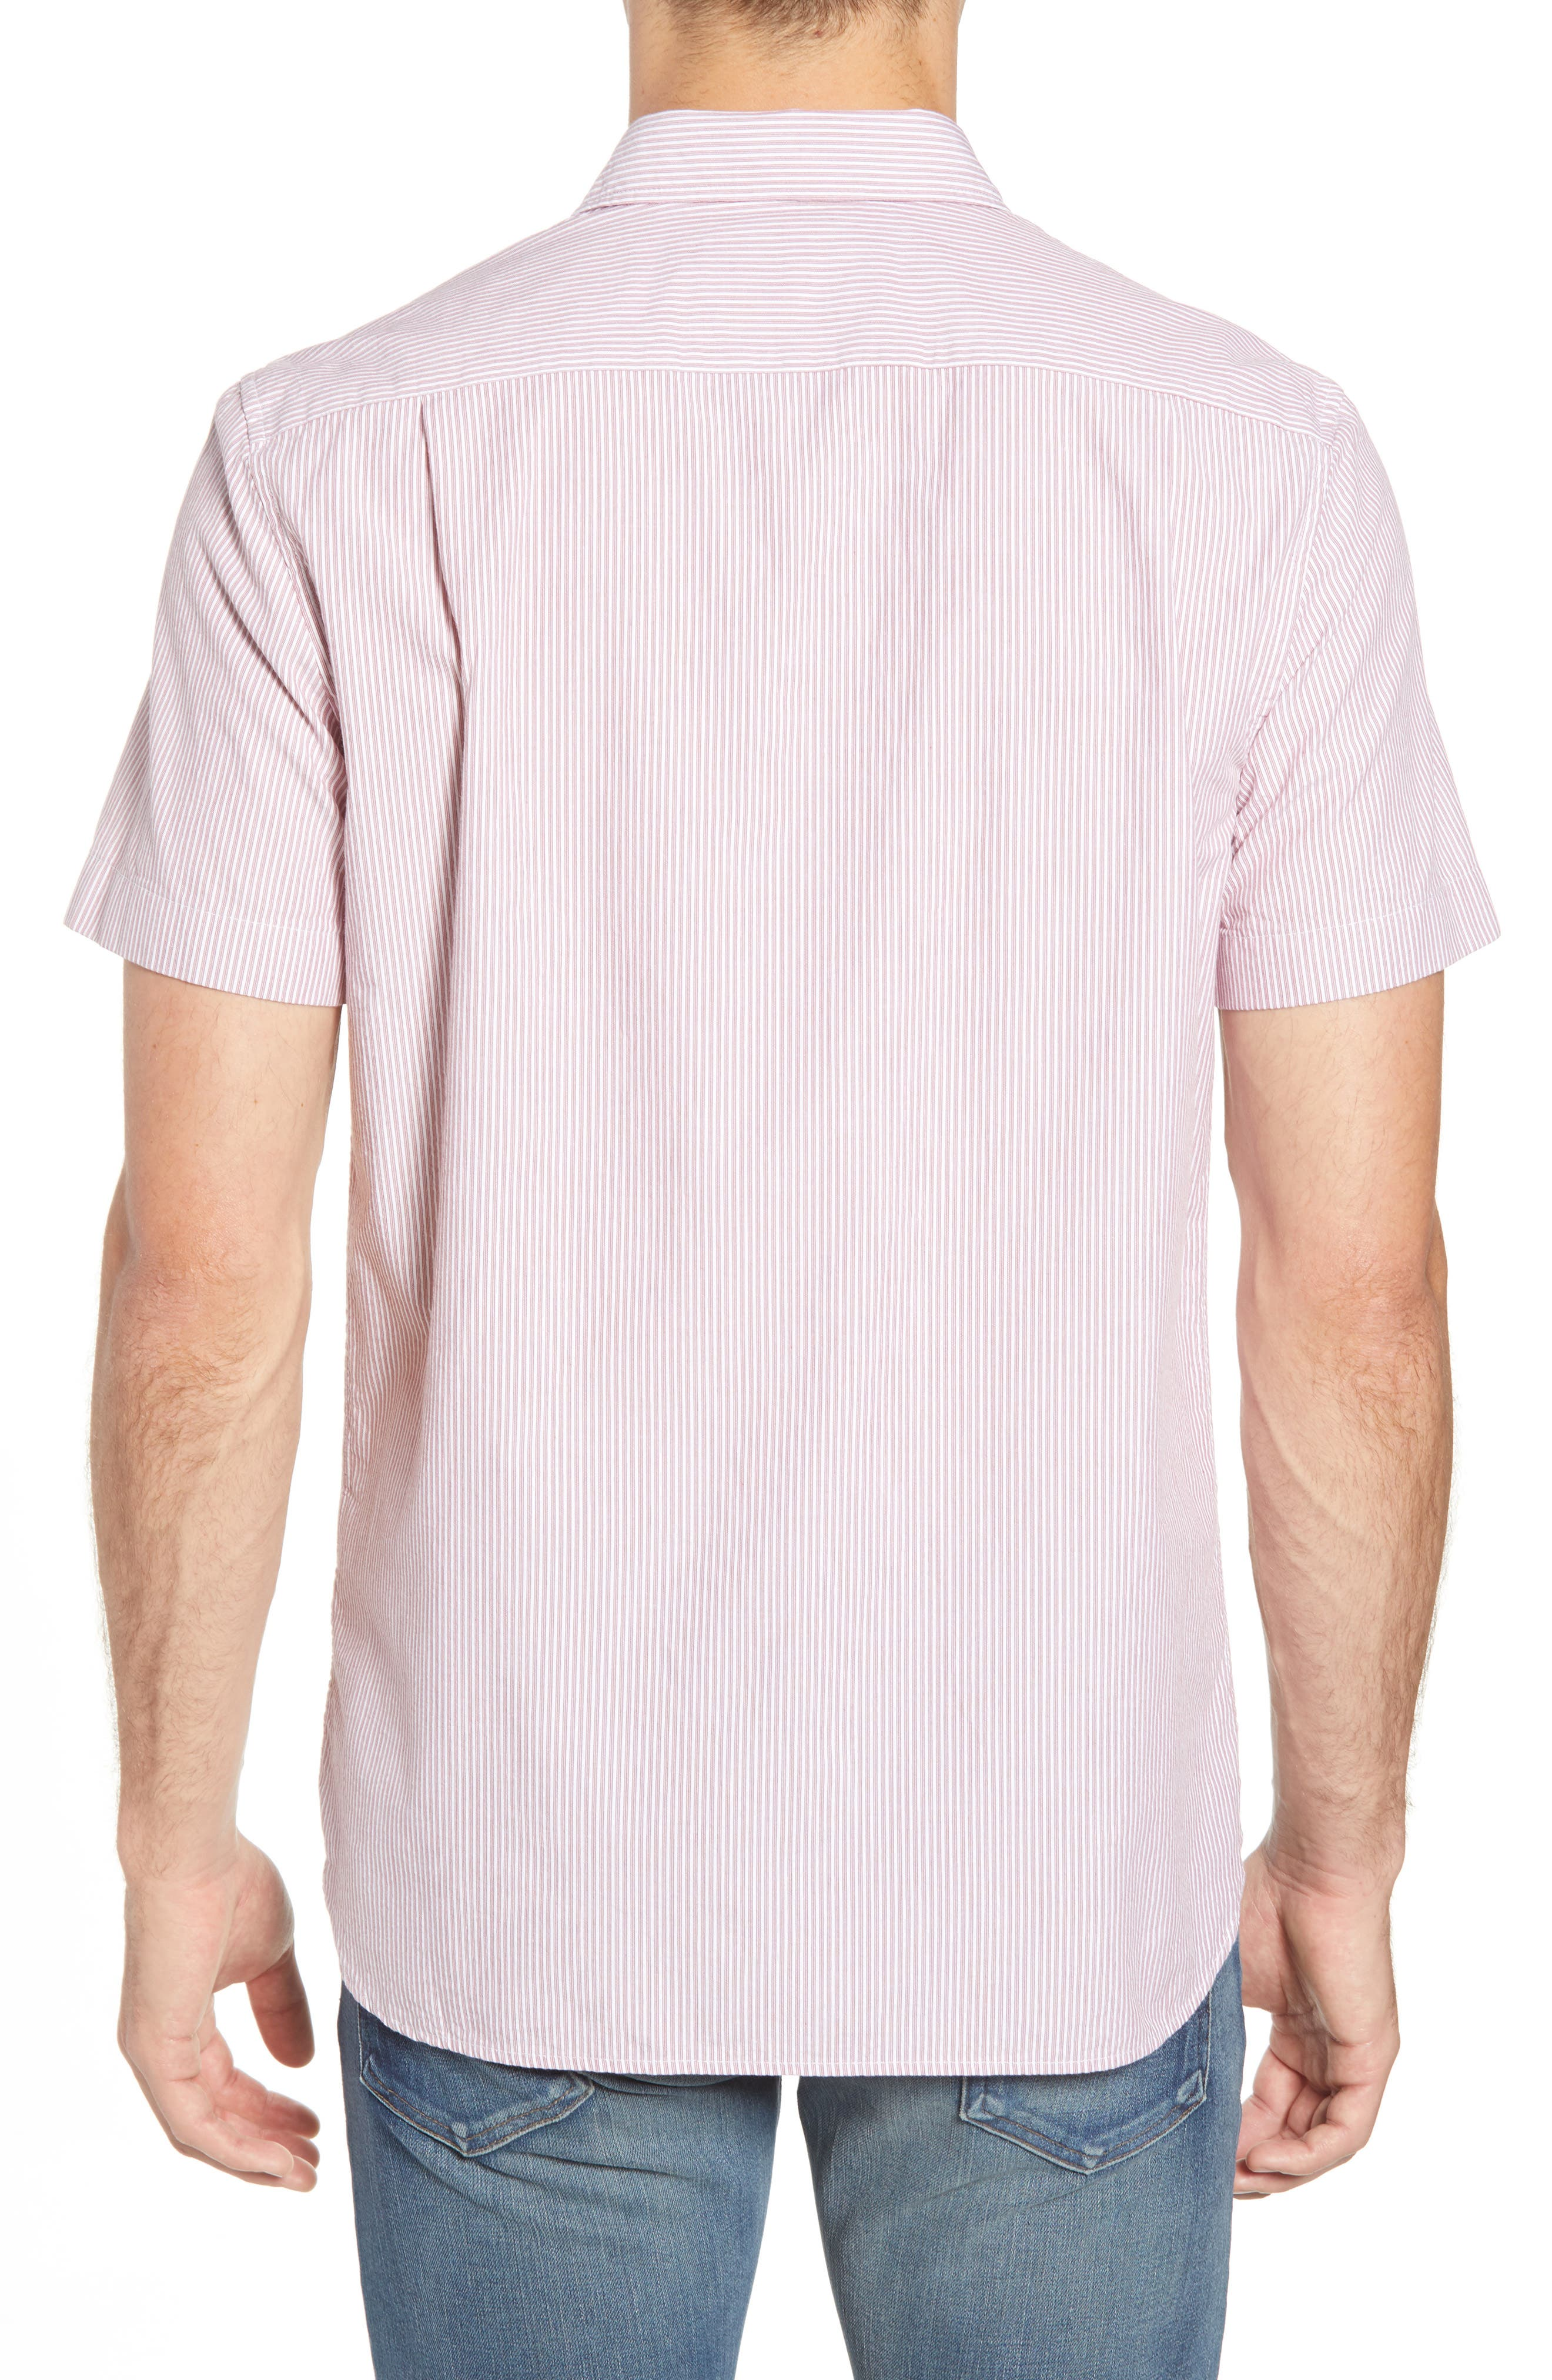 Regular Fit Seersucker Sport Shirt,                             Alternate thumbnail 2, color,                             TOREADOR